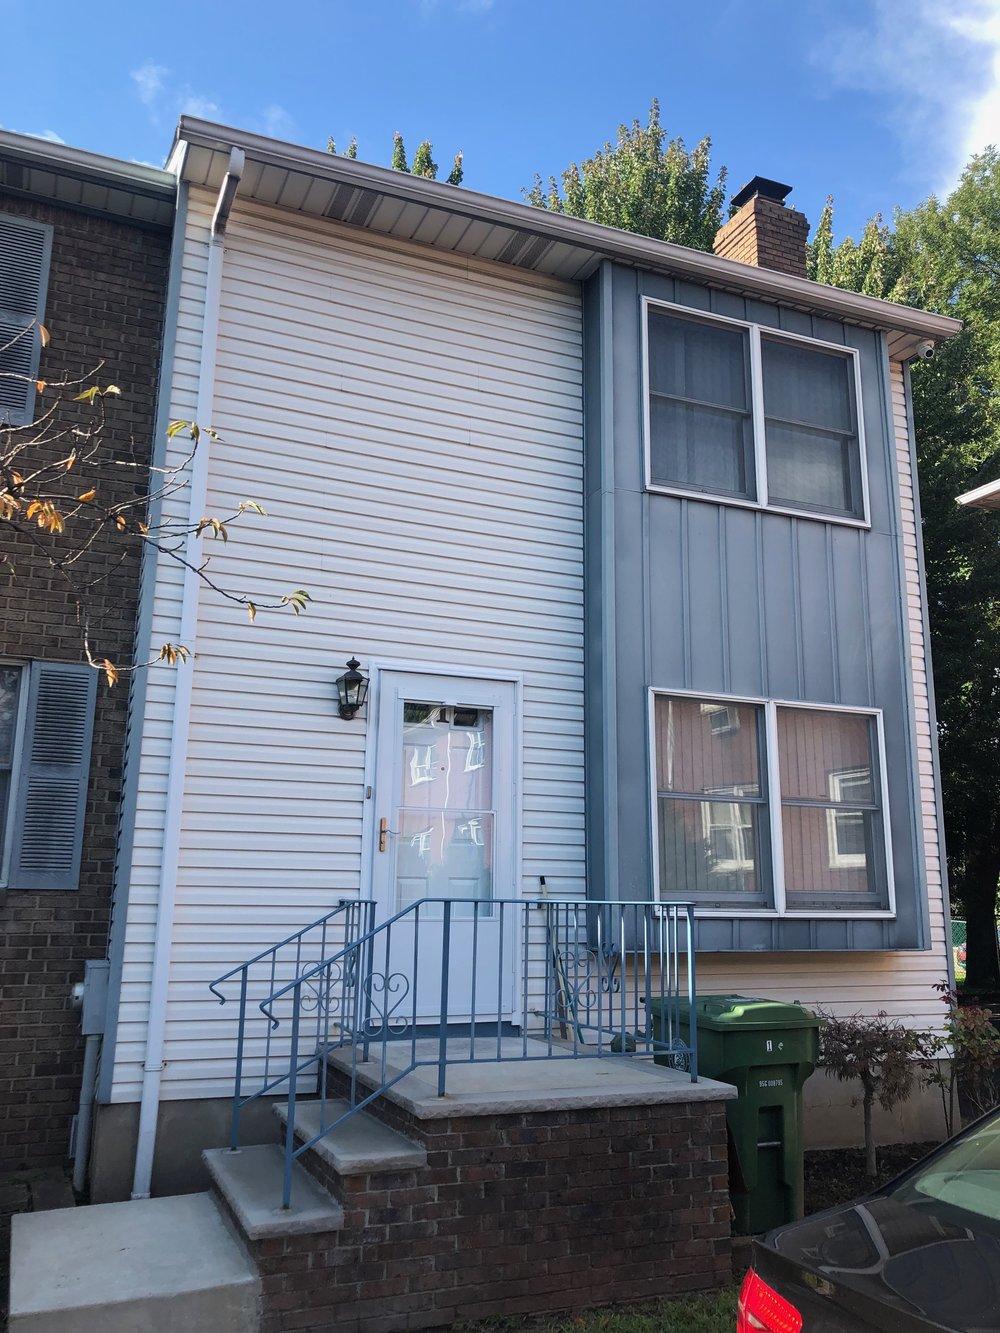 400 W. Elizabeth Ave, Unit 1, Linden -